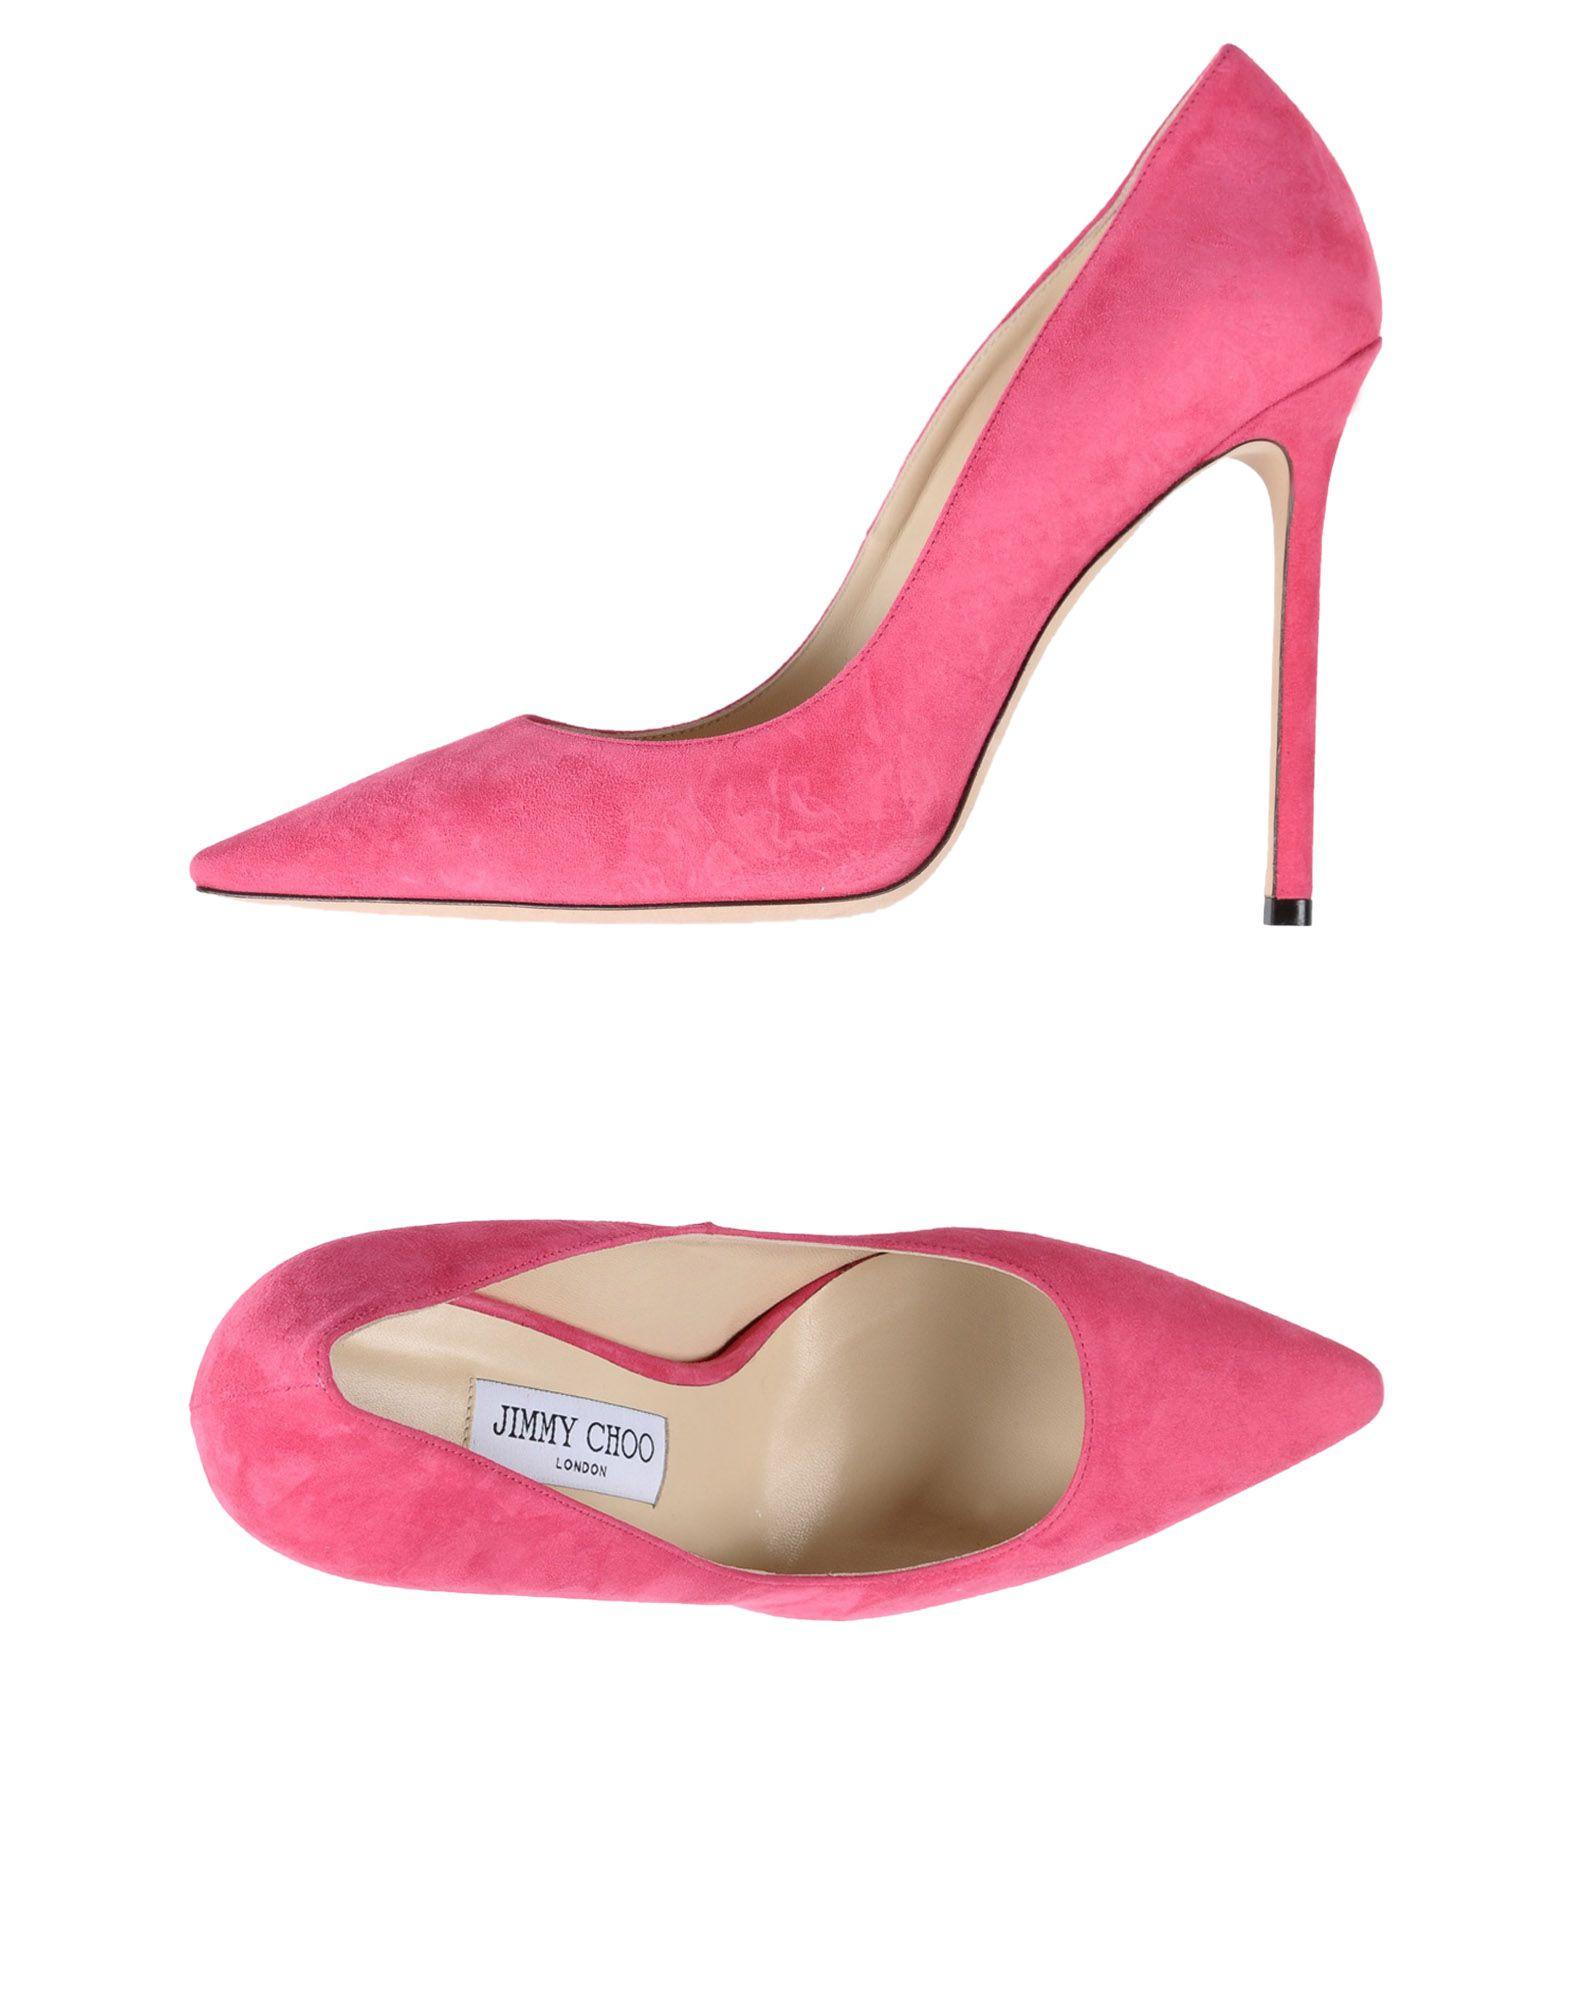 Jimmy Choo Pumps Damen  11505265TL Beliebte Beliebte Beliebte Schuhe 4fabaa